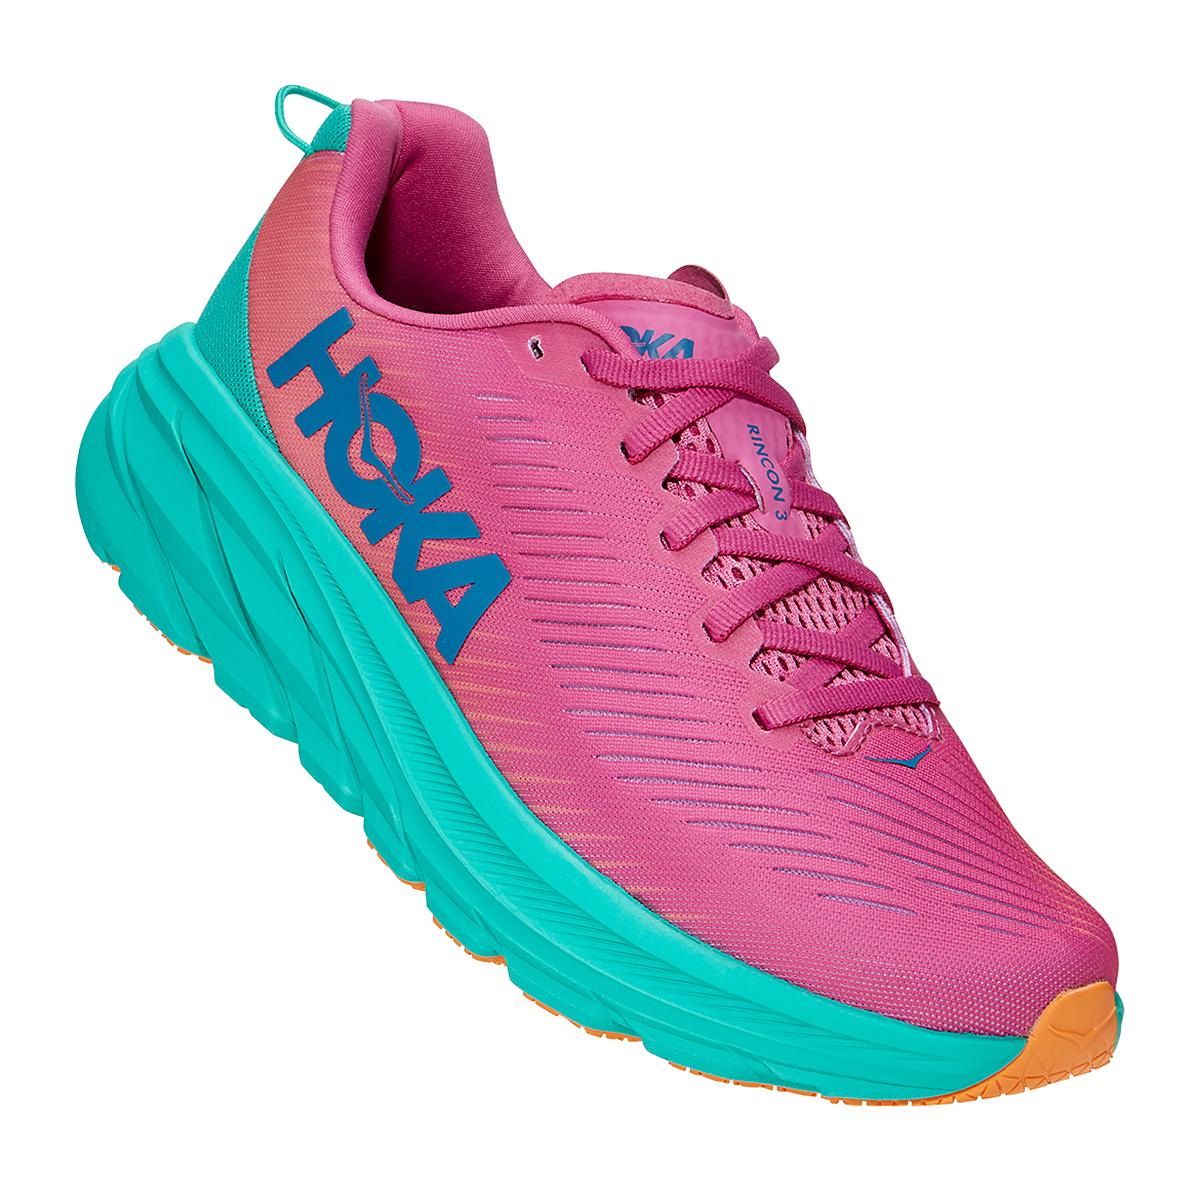 Women's Hoka One One Rincon 3 Running Shoe - Color: Phlox Pink/Atlantis - Size: 5 - Width: Regular, Phlox Pink/Atlantis, large, image 2